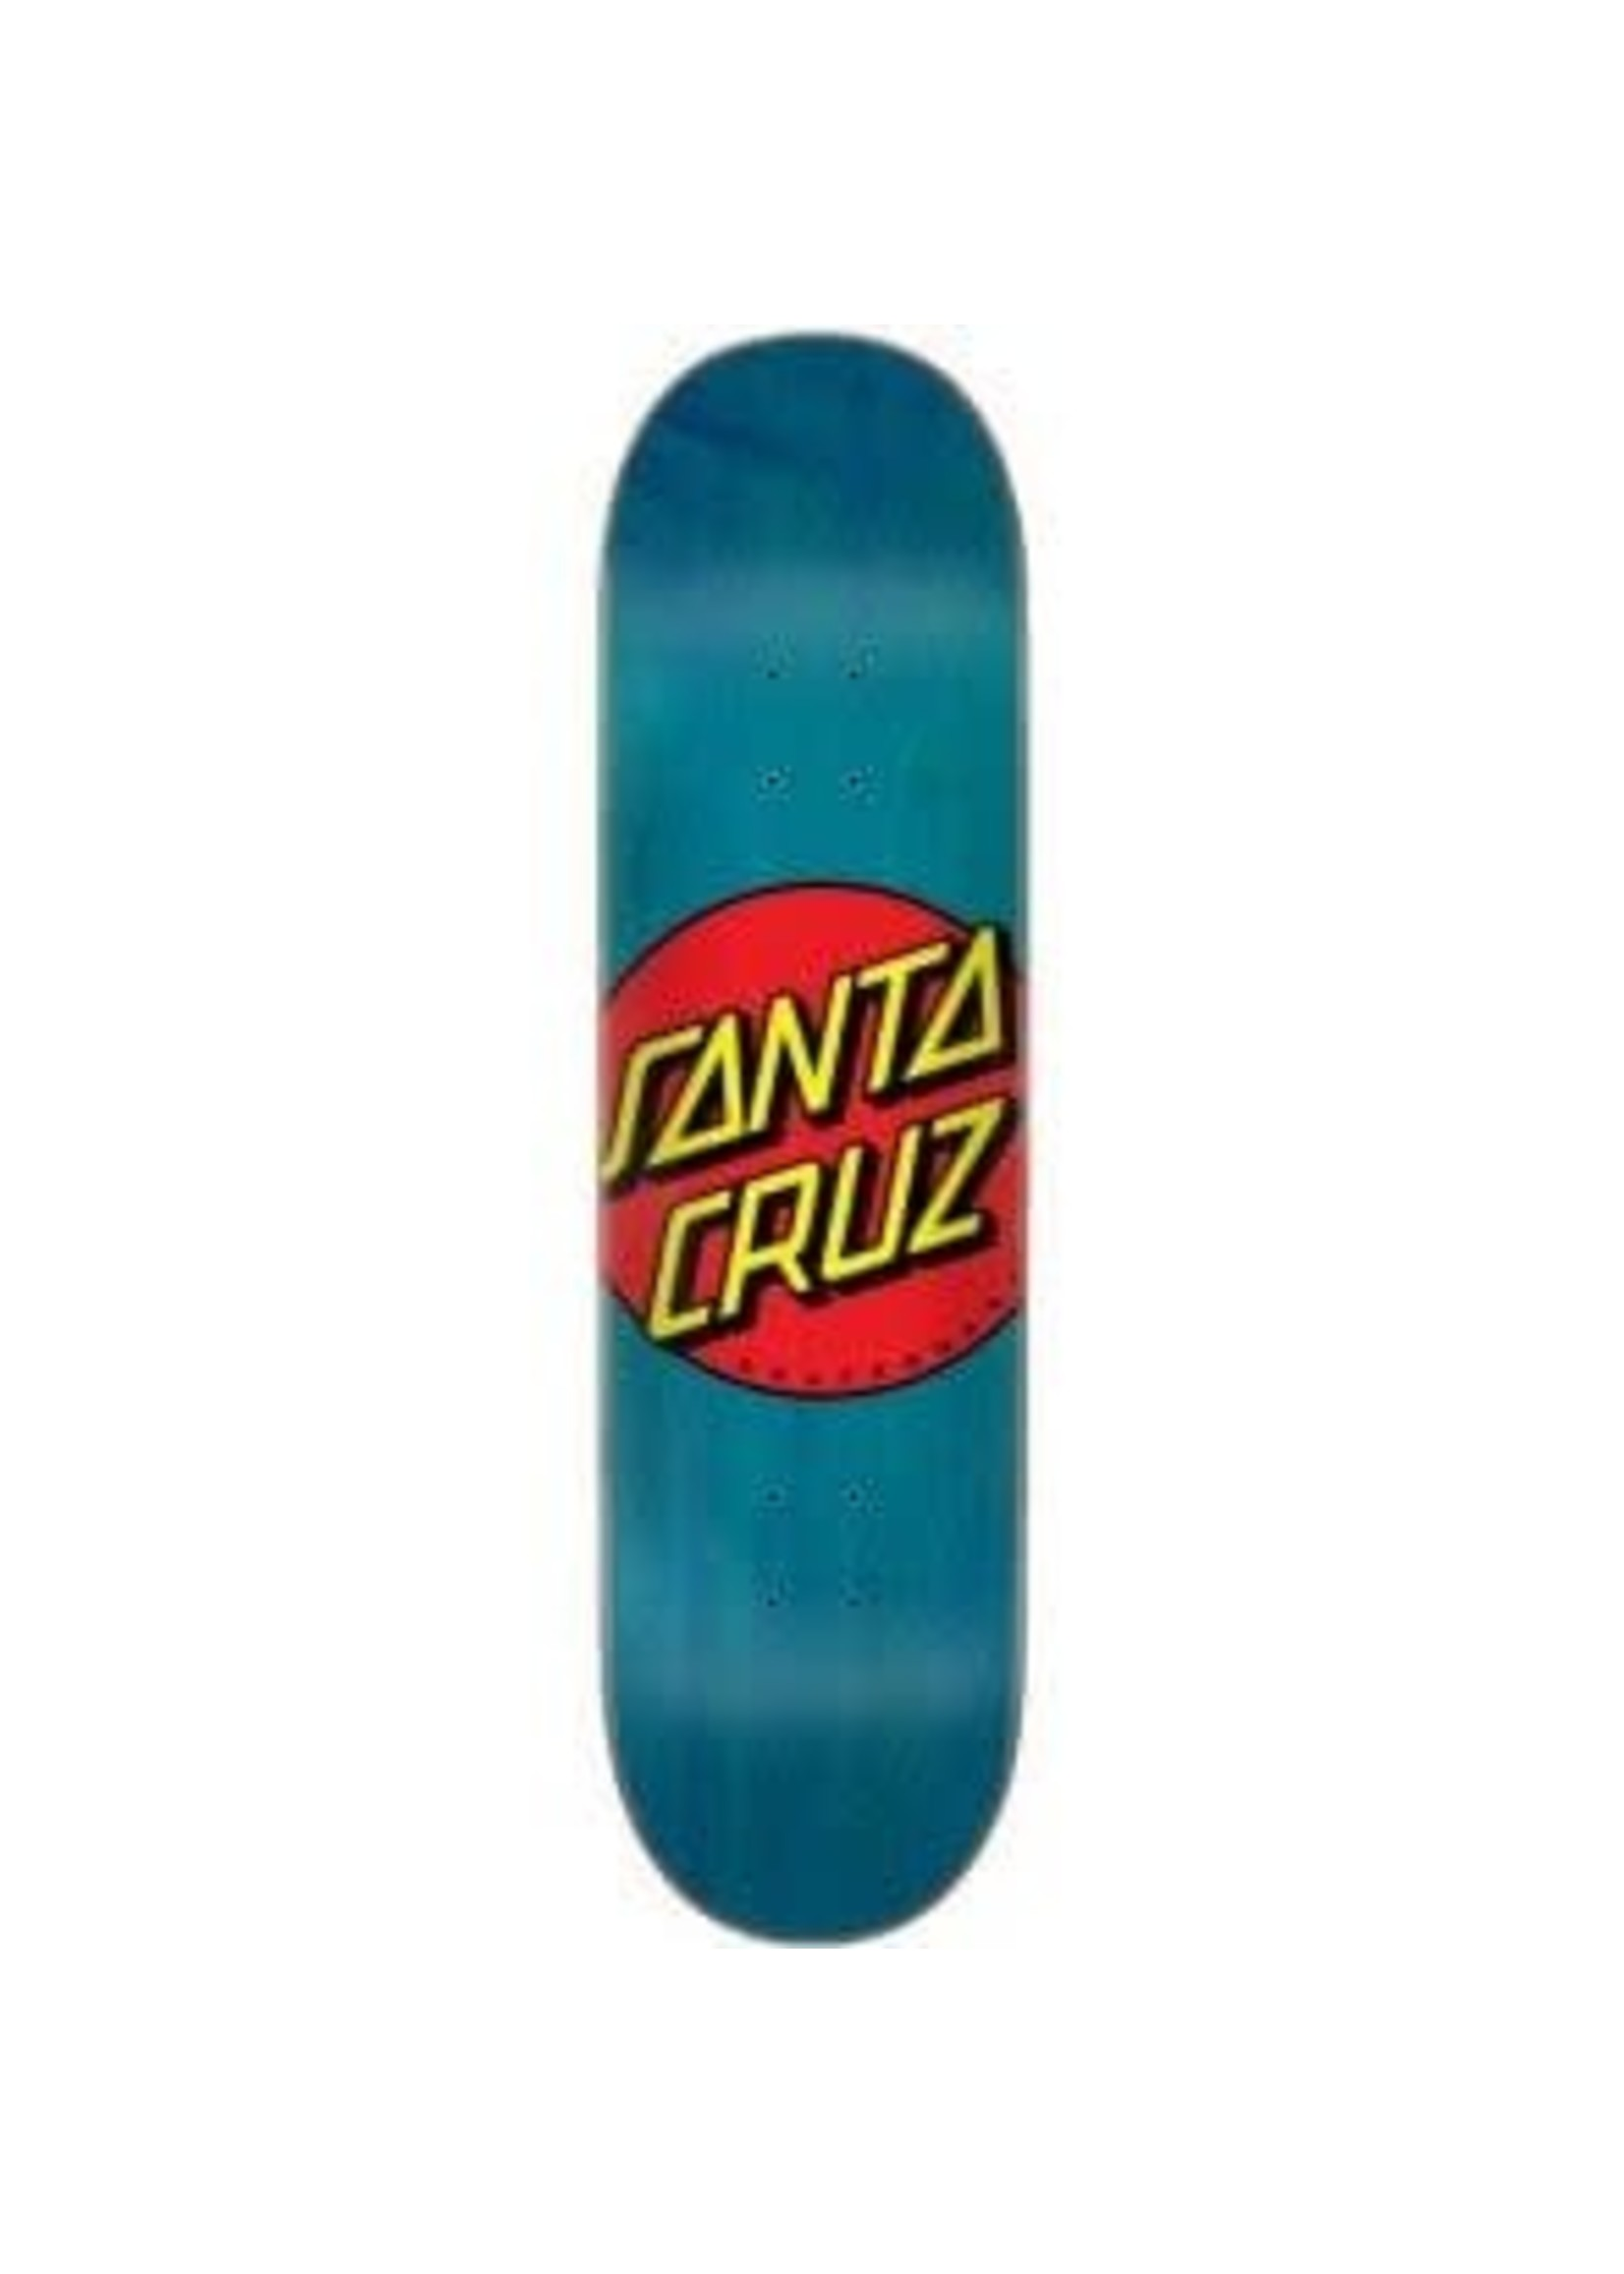 Santa Cruz Santa Cruz classic dot Deck